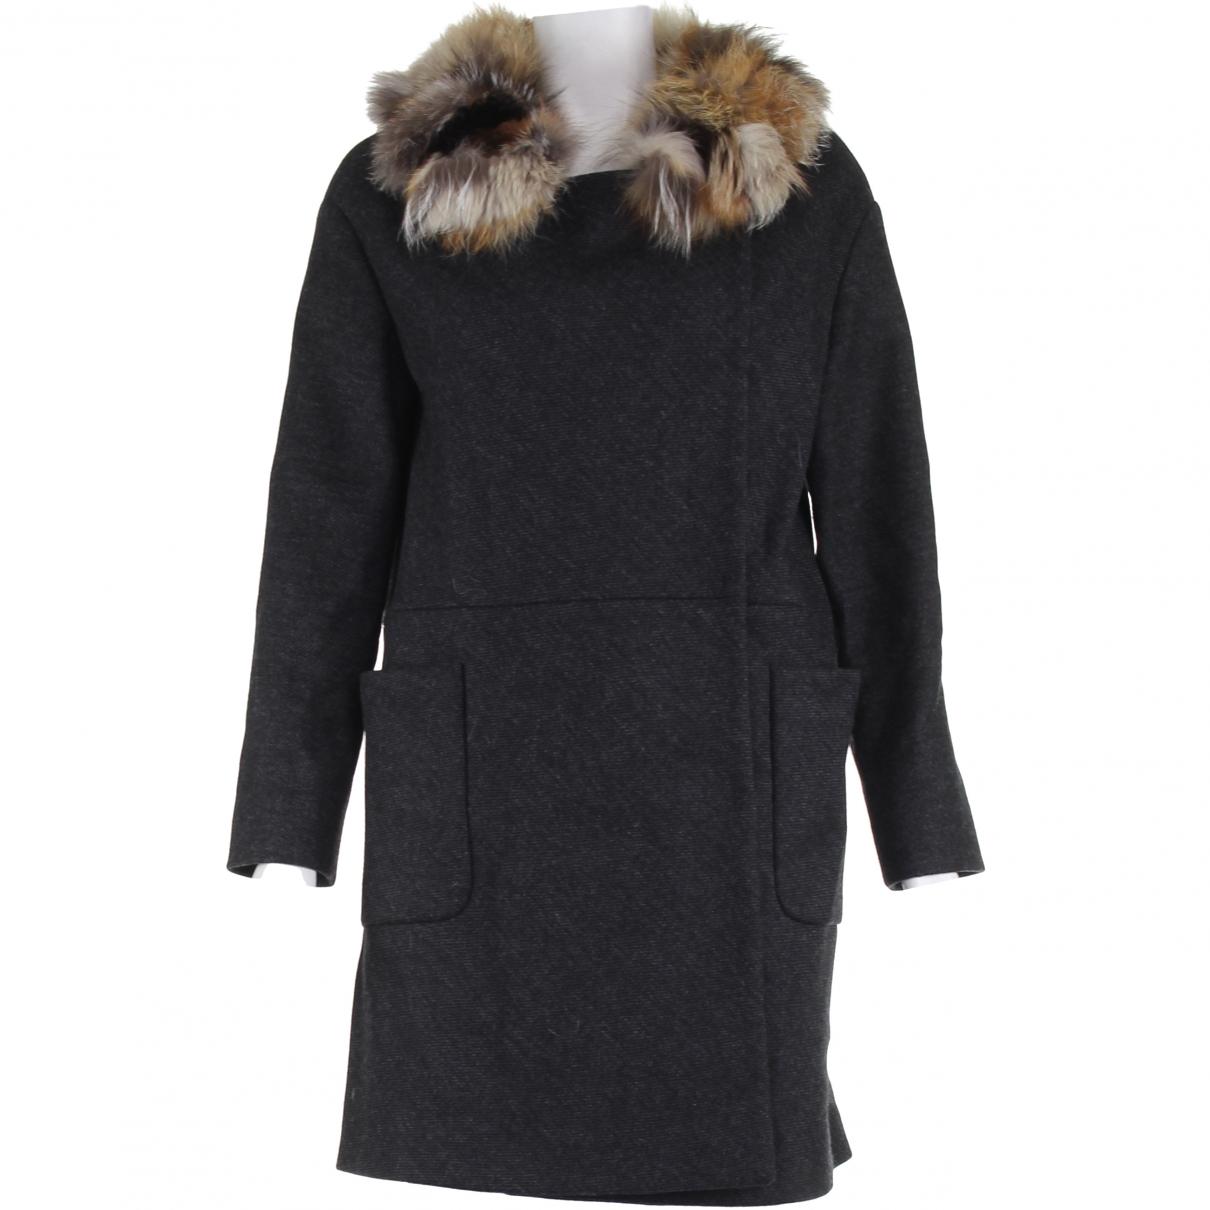 Miu Miu \N Grey Wool coat for Women 40 IT